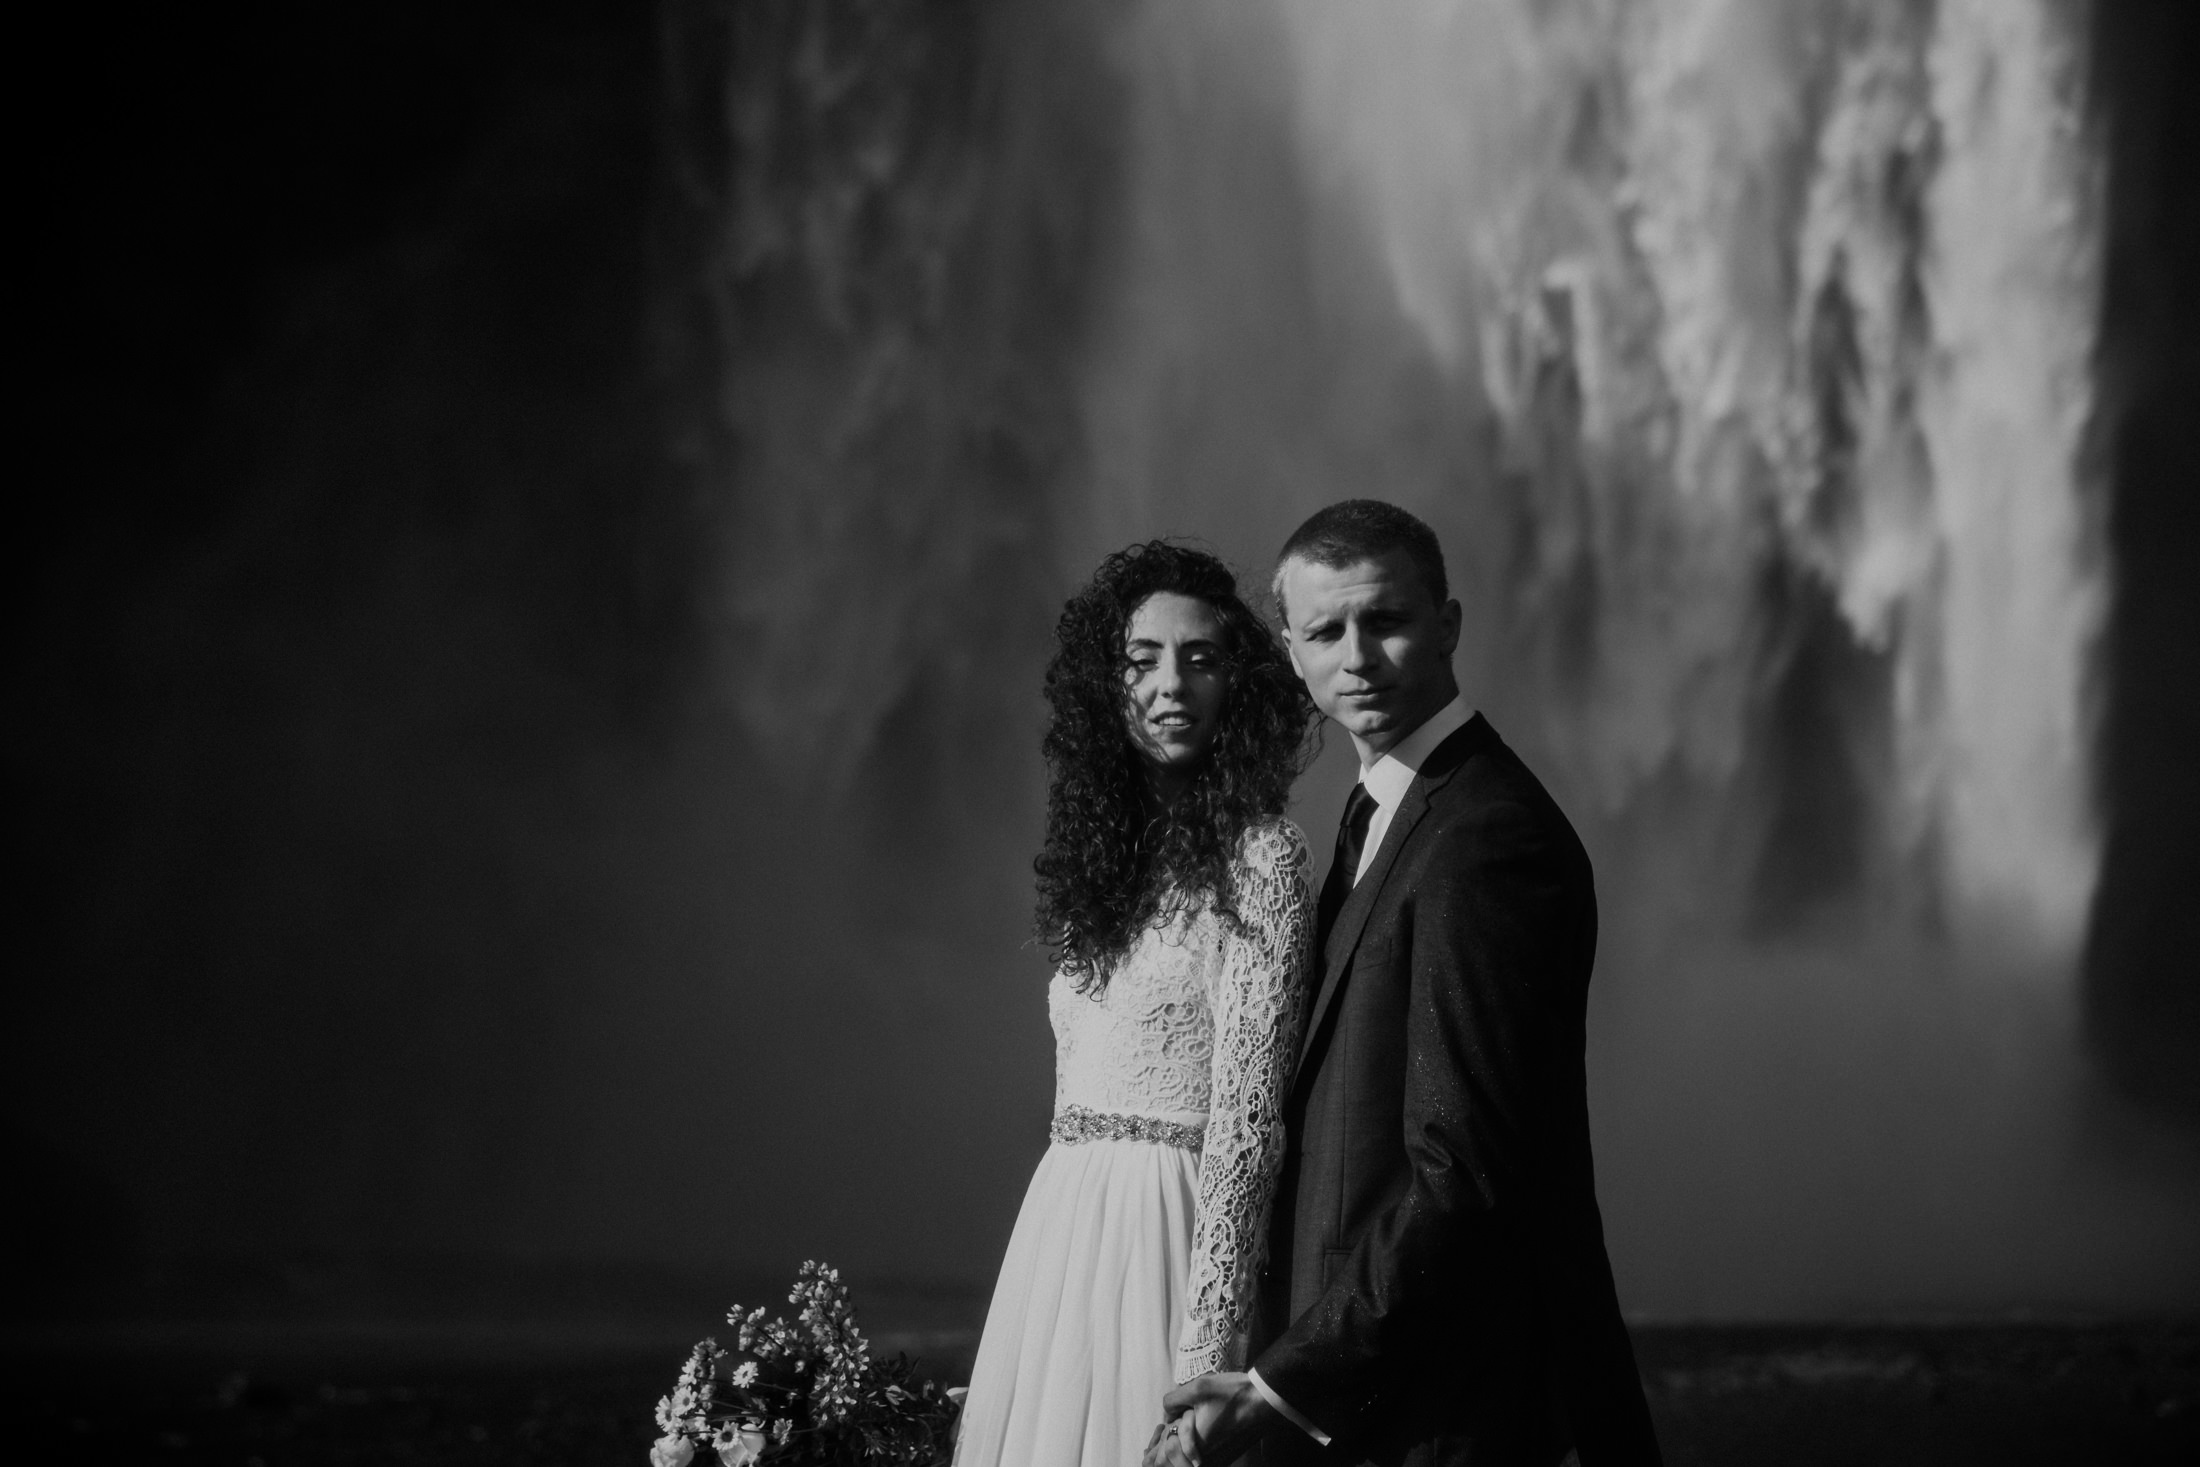 moody-elopement-photos-at-skogafoss-waterfall-in-iceland-narrowleaf-photography-4954.JPG